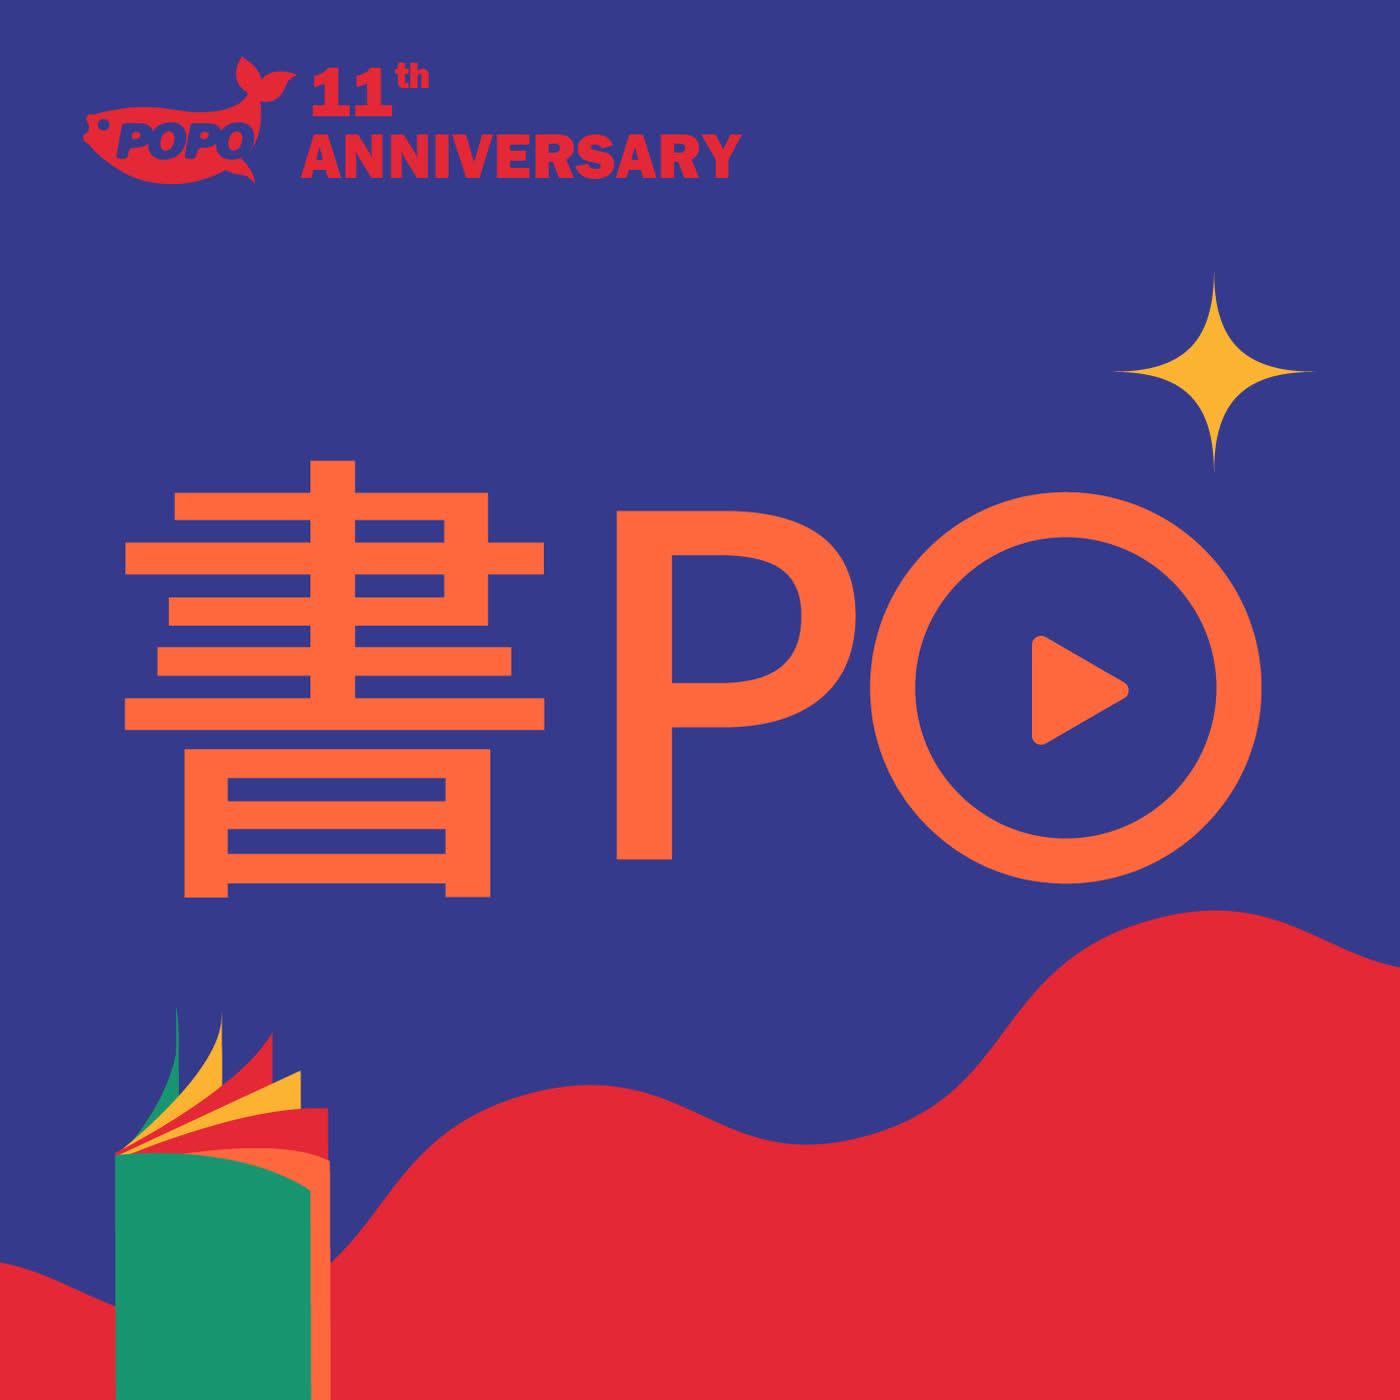 POPO線上編輯室EP3:淘汰作品不眨眼的華文創作大賞評審,你們的良心不會痛嗎ft.大賞評審